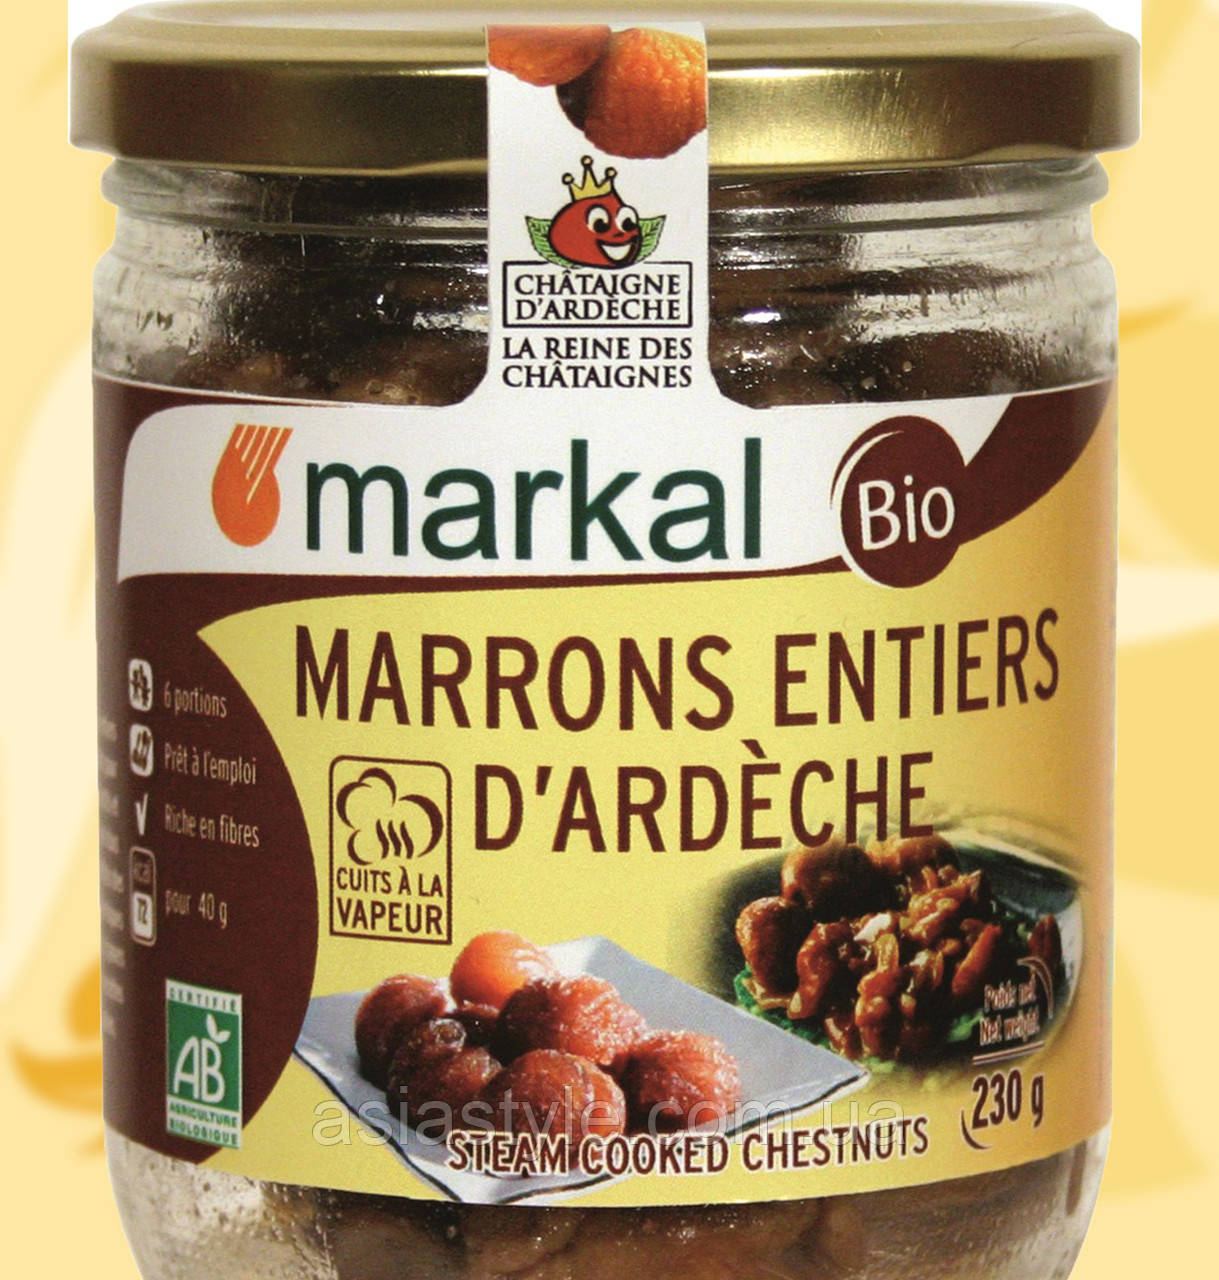 Каштани очищені, органічні, 230г, Markal, Marrons Entiers D`ardeche, Bio, Me